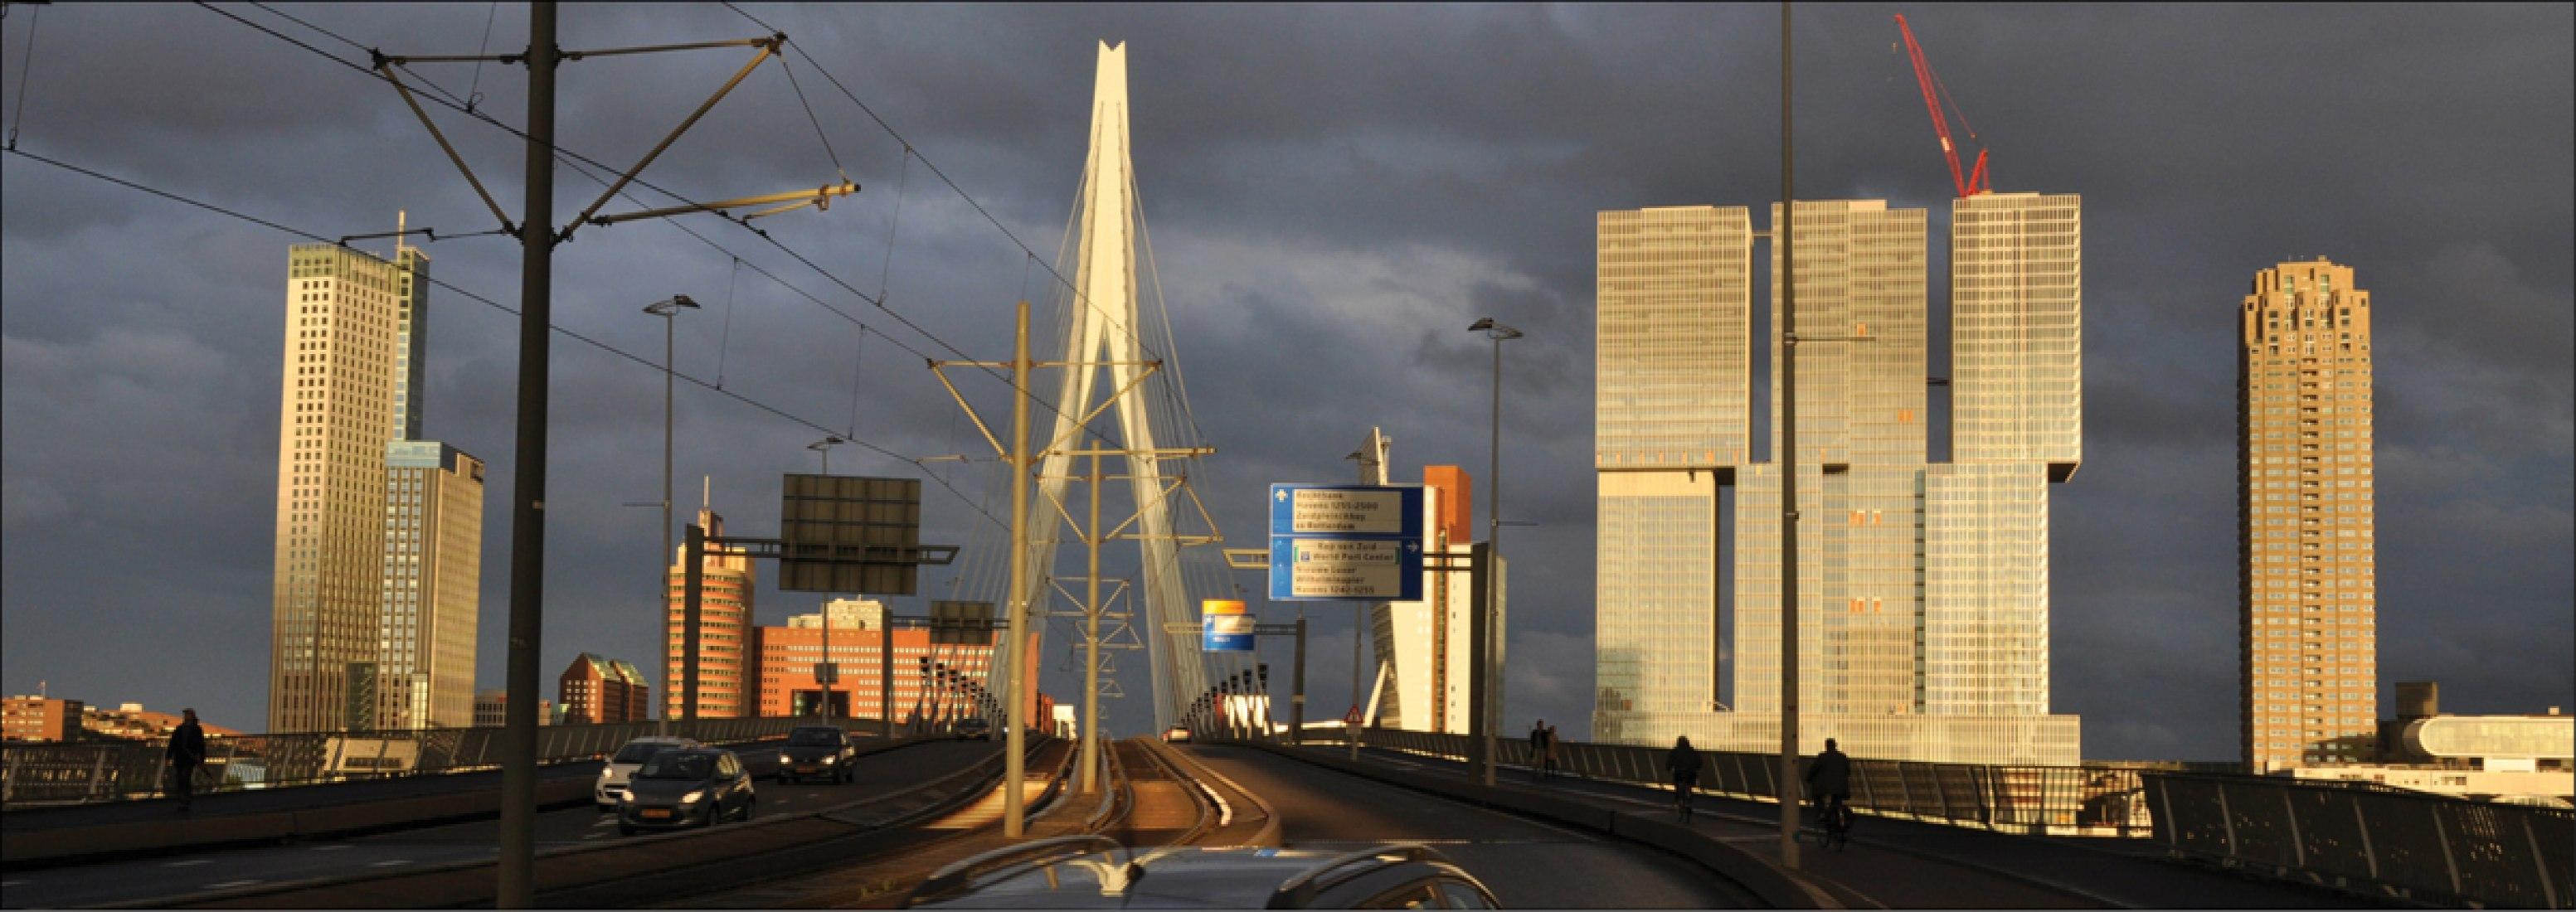 Frontal with bridge vision. Image courtesy of OMA; Photography © Michel van de Kar.